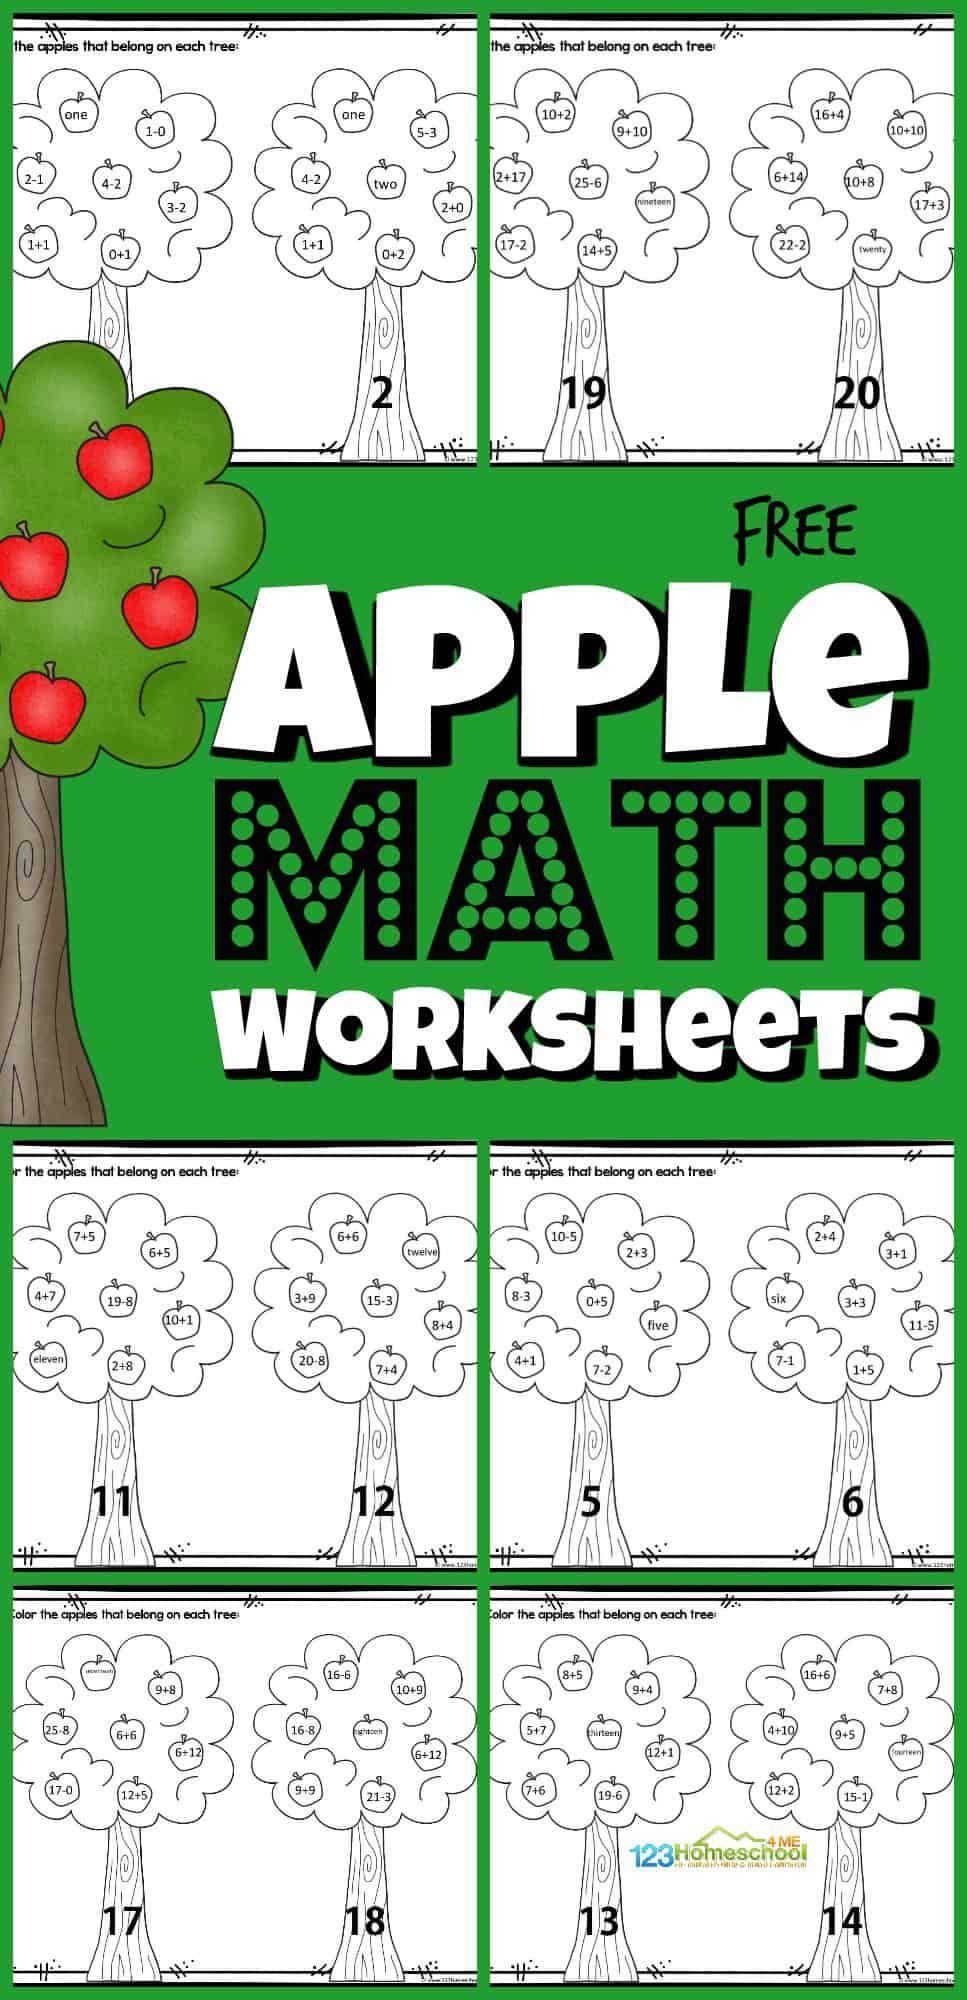 Apple Math Worksheets Apple Math Worksheets Apple Math Math Worksheets